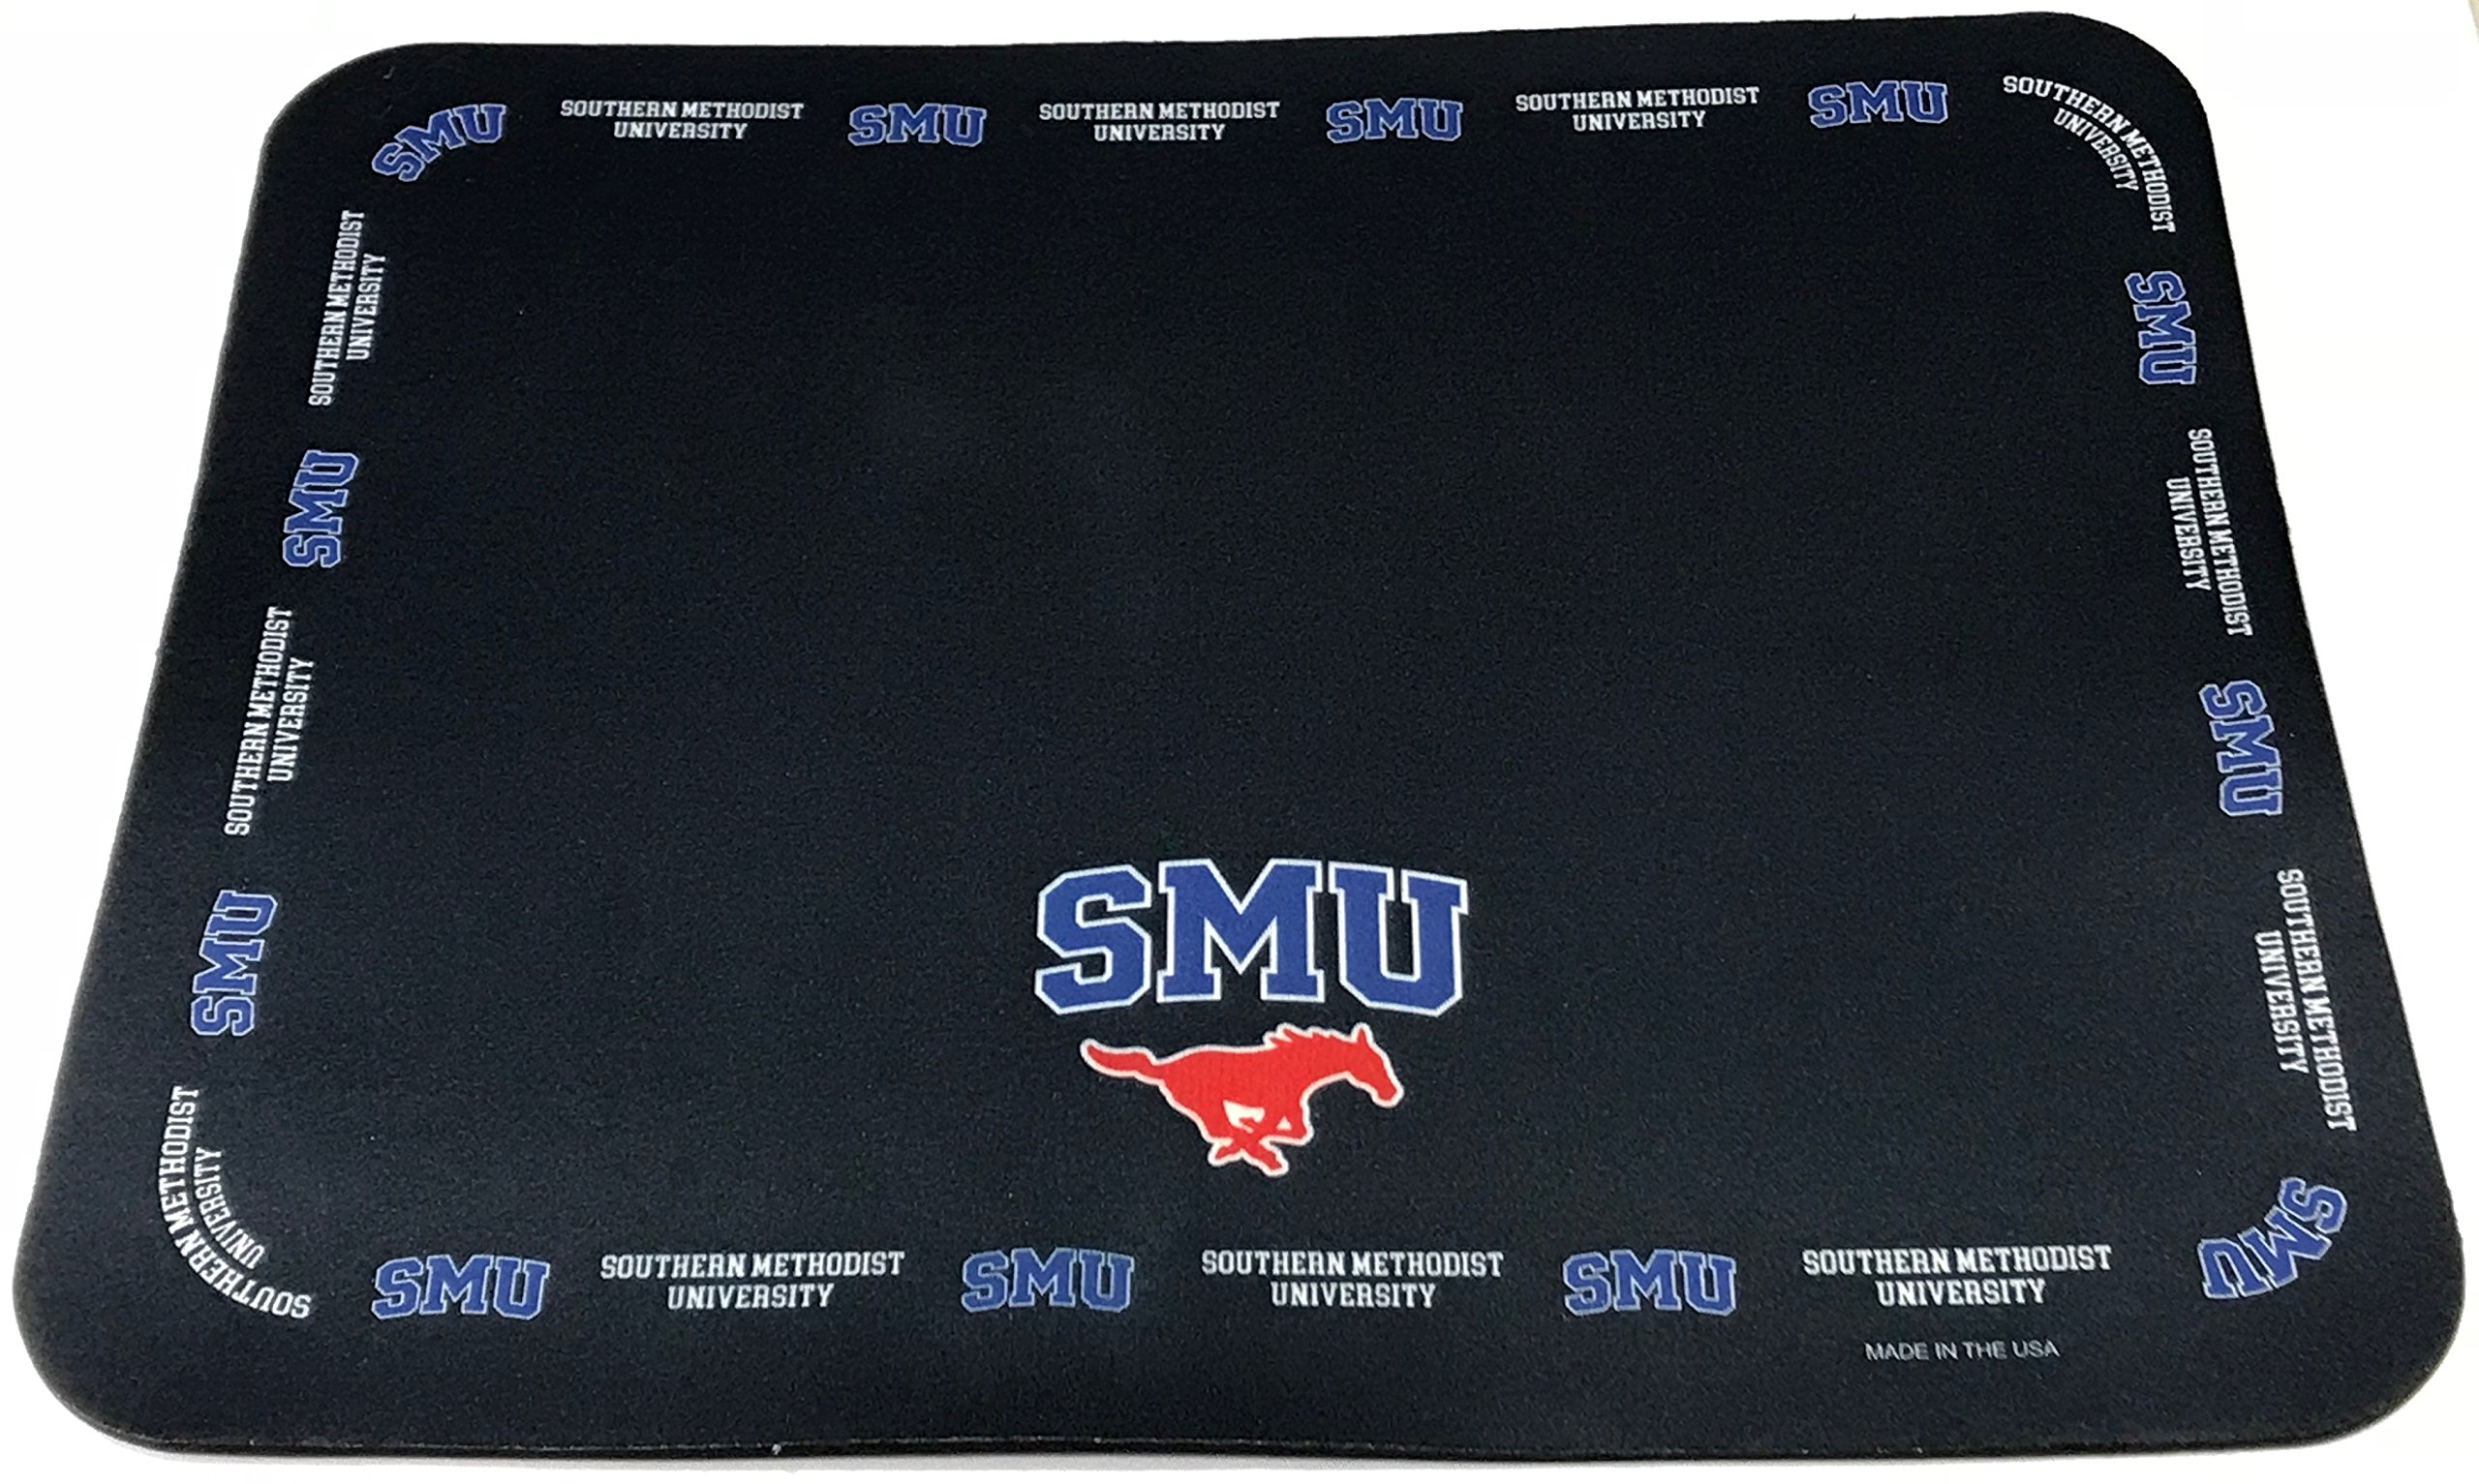 NCAA Collegiate Placemats - Southern Methodist University SMU Mustangs - Set of 4